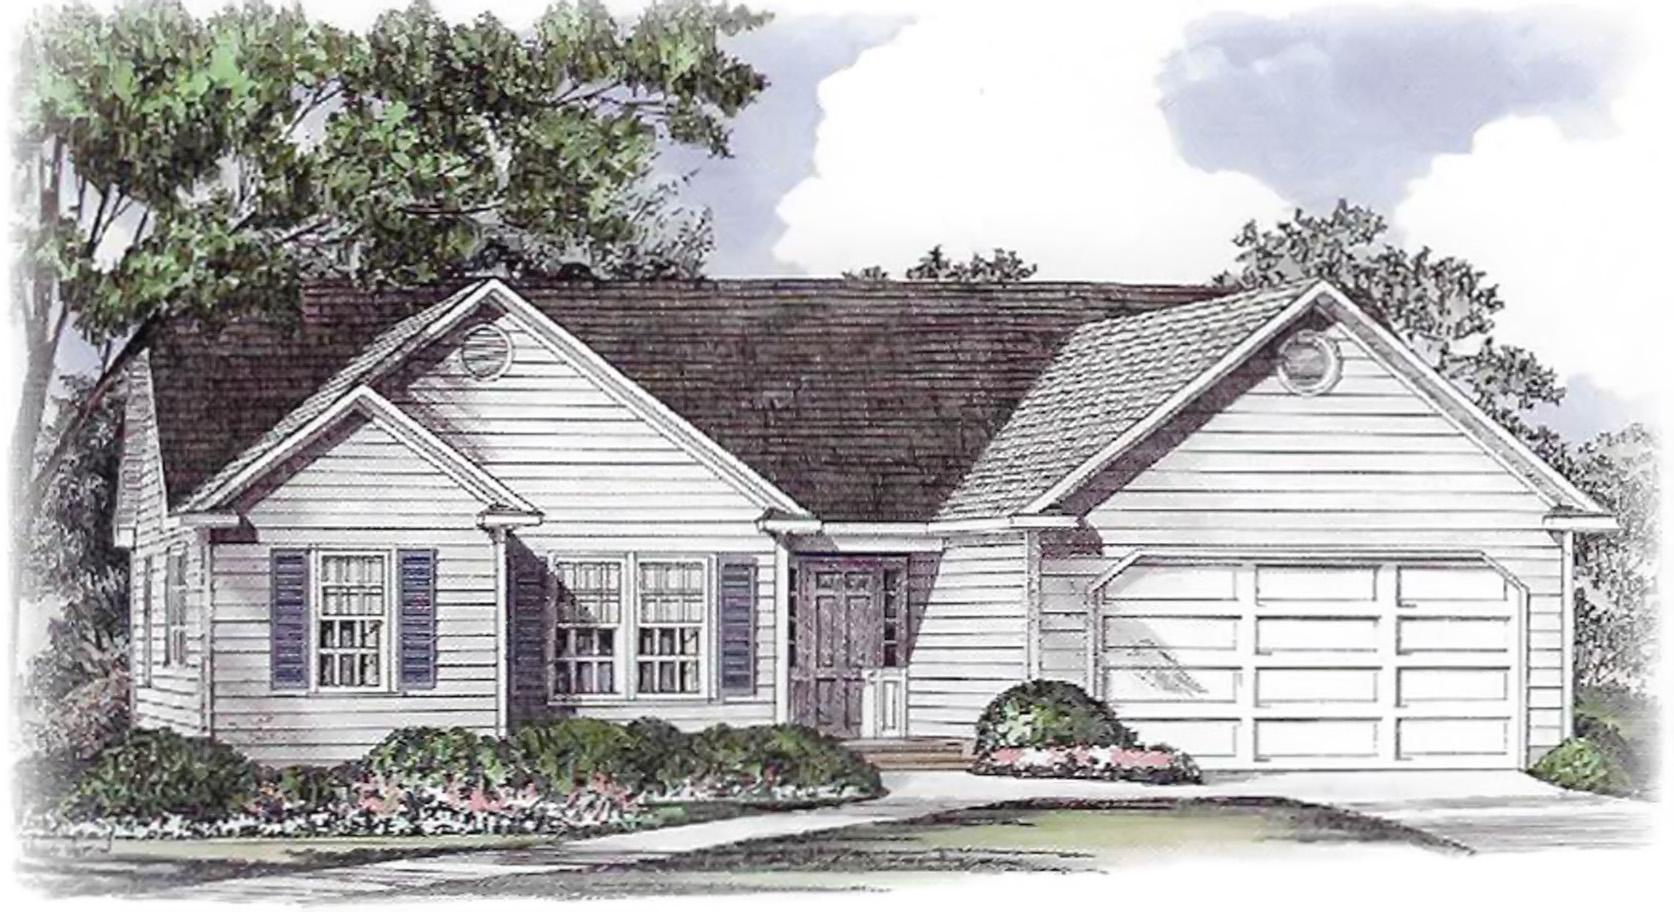 Lynnwood Pennyworth Homes Tallahassee Home Builder